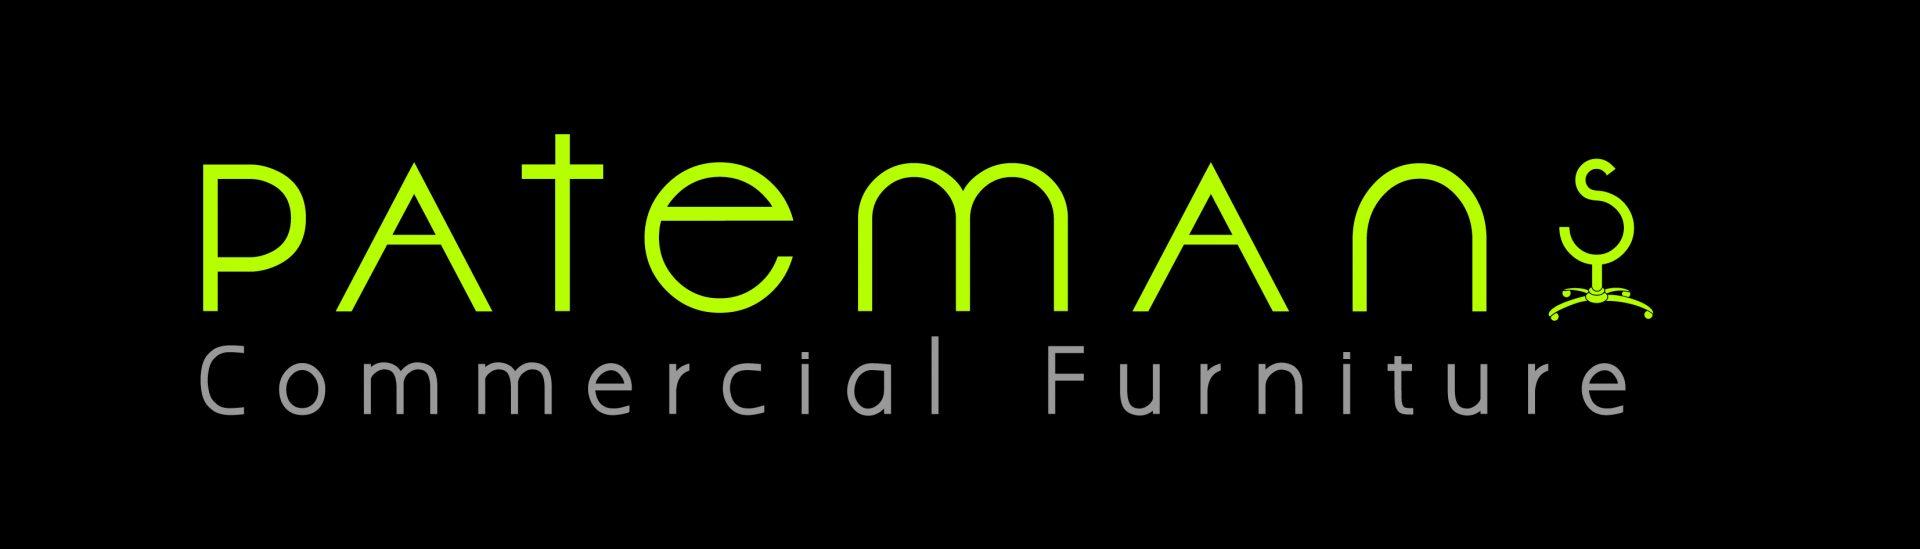 Patemans Commercial Furniture – Timaru